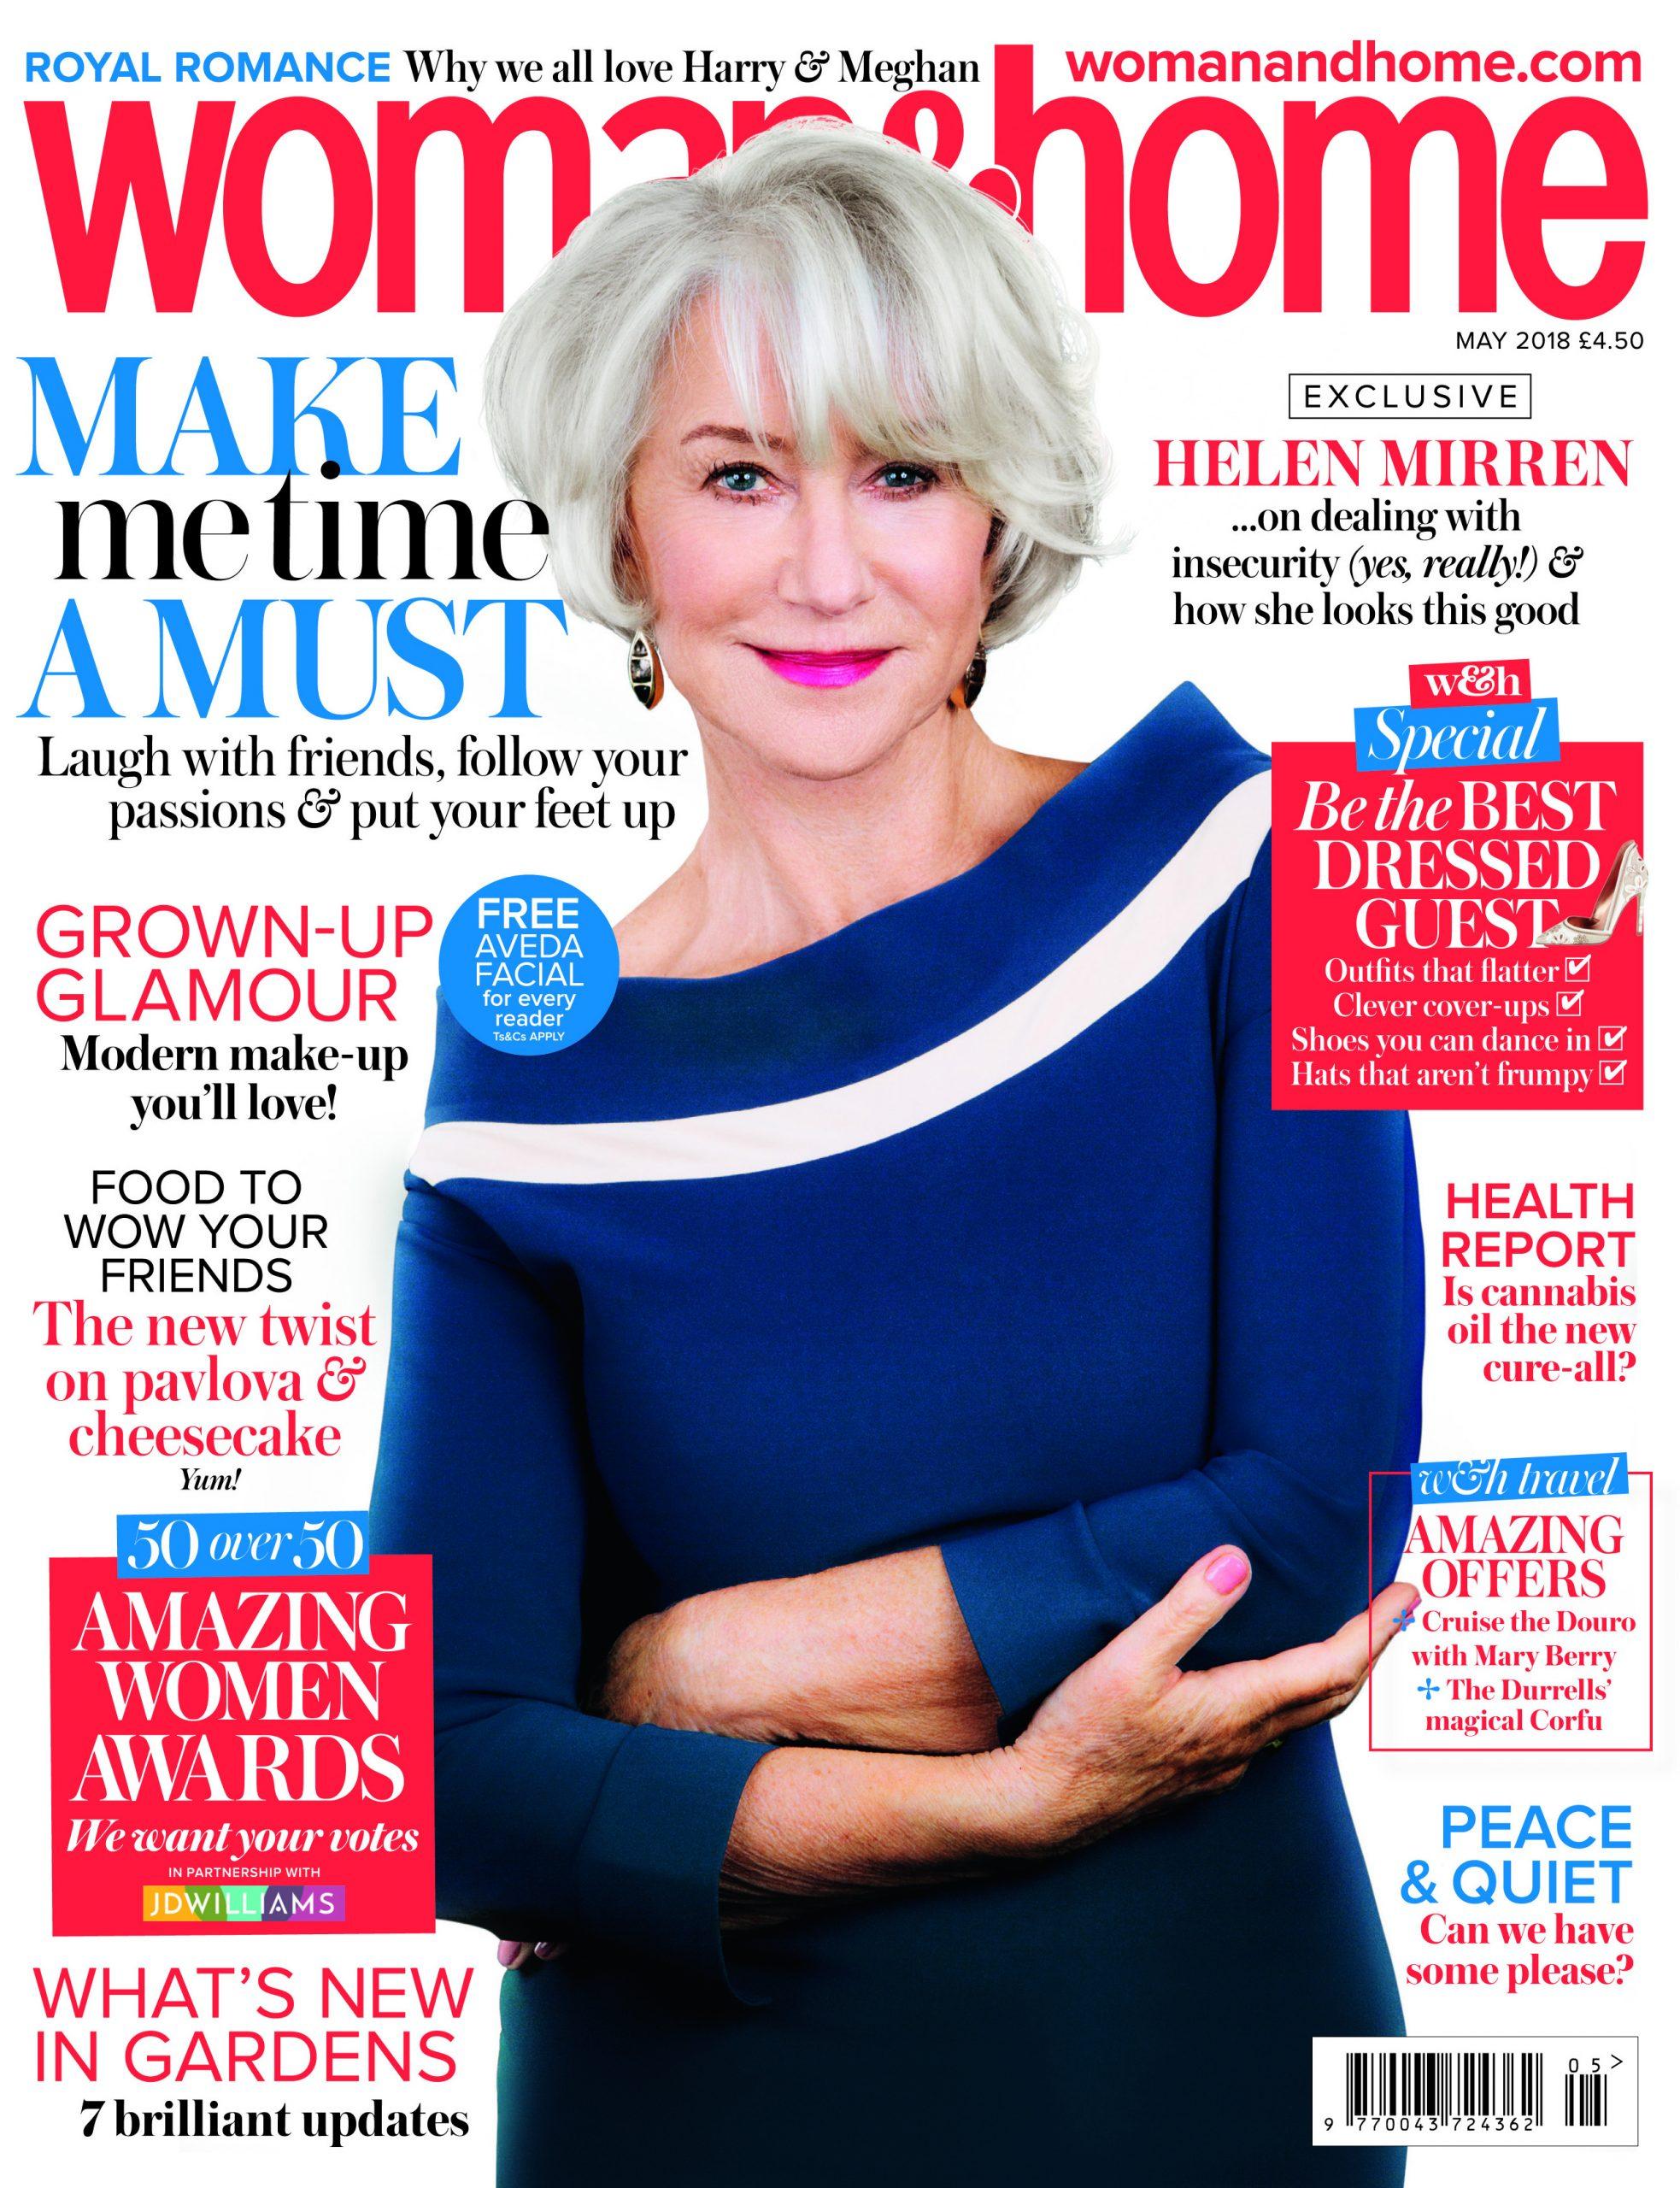 Woman & Home May 2018 - Helen Mirren